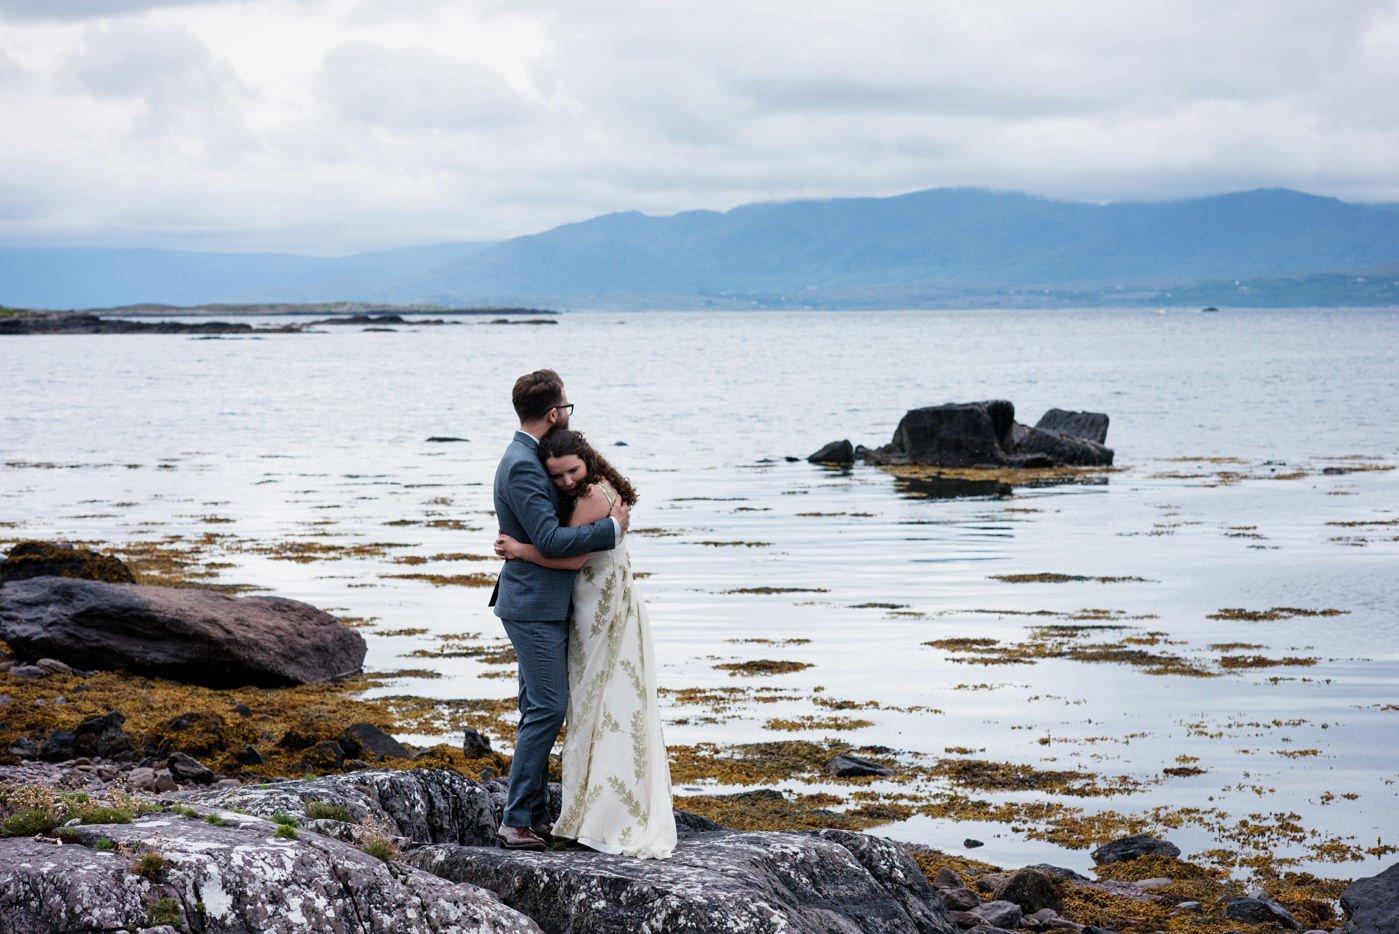 Alternative wedding photographer floral wedding dress